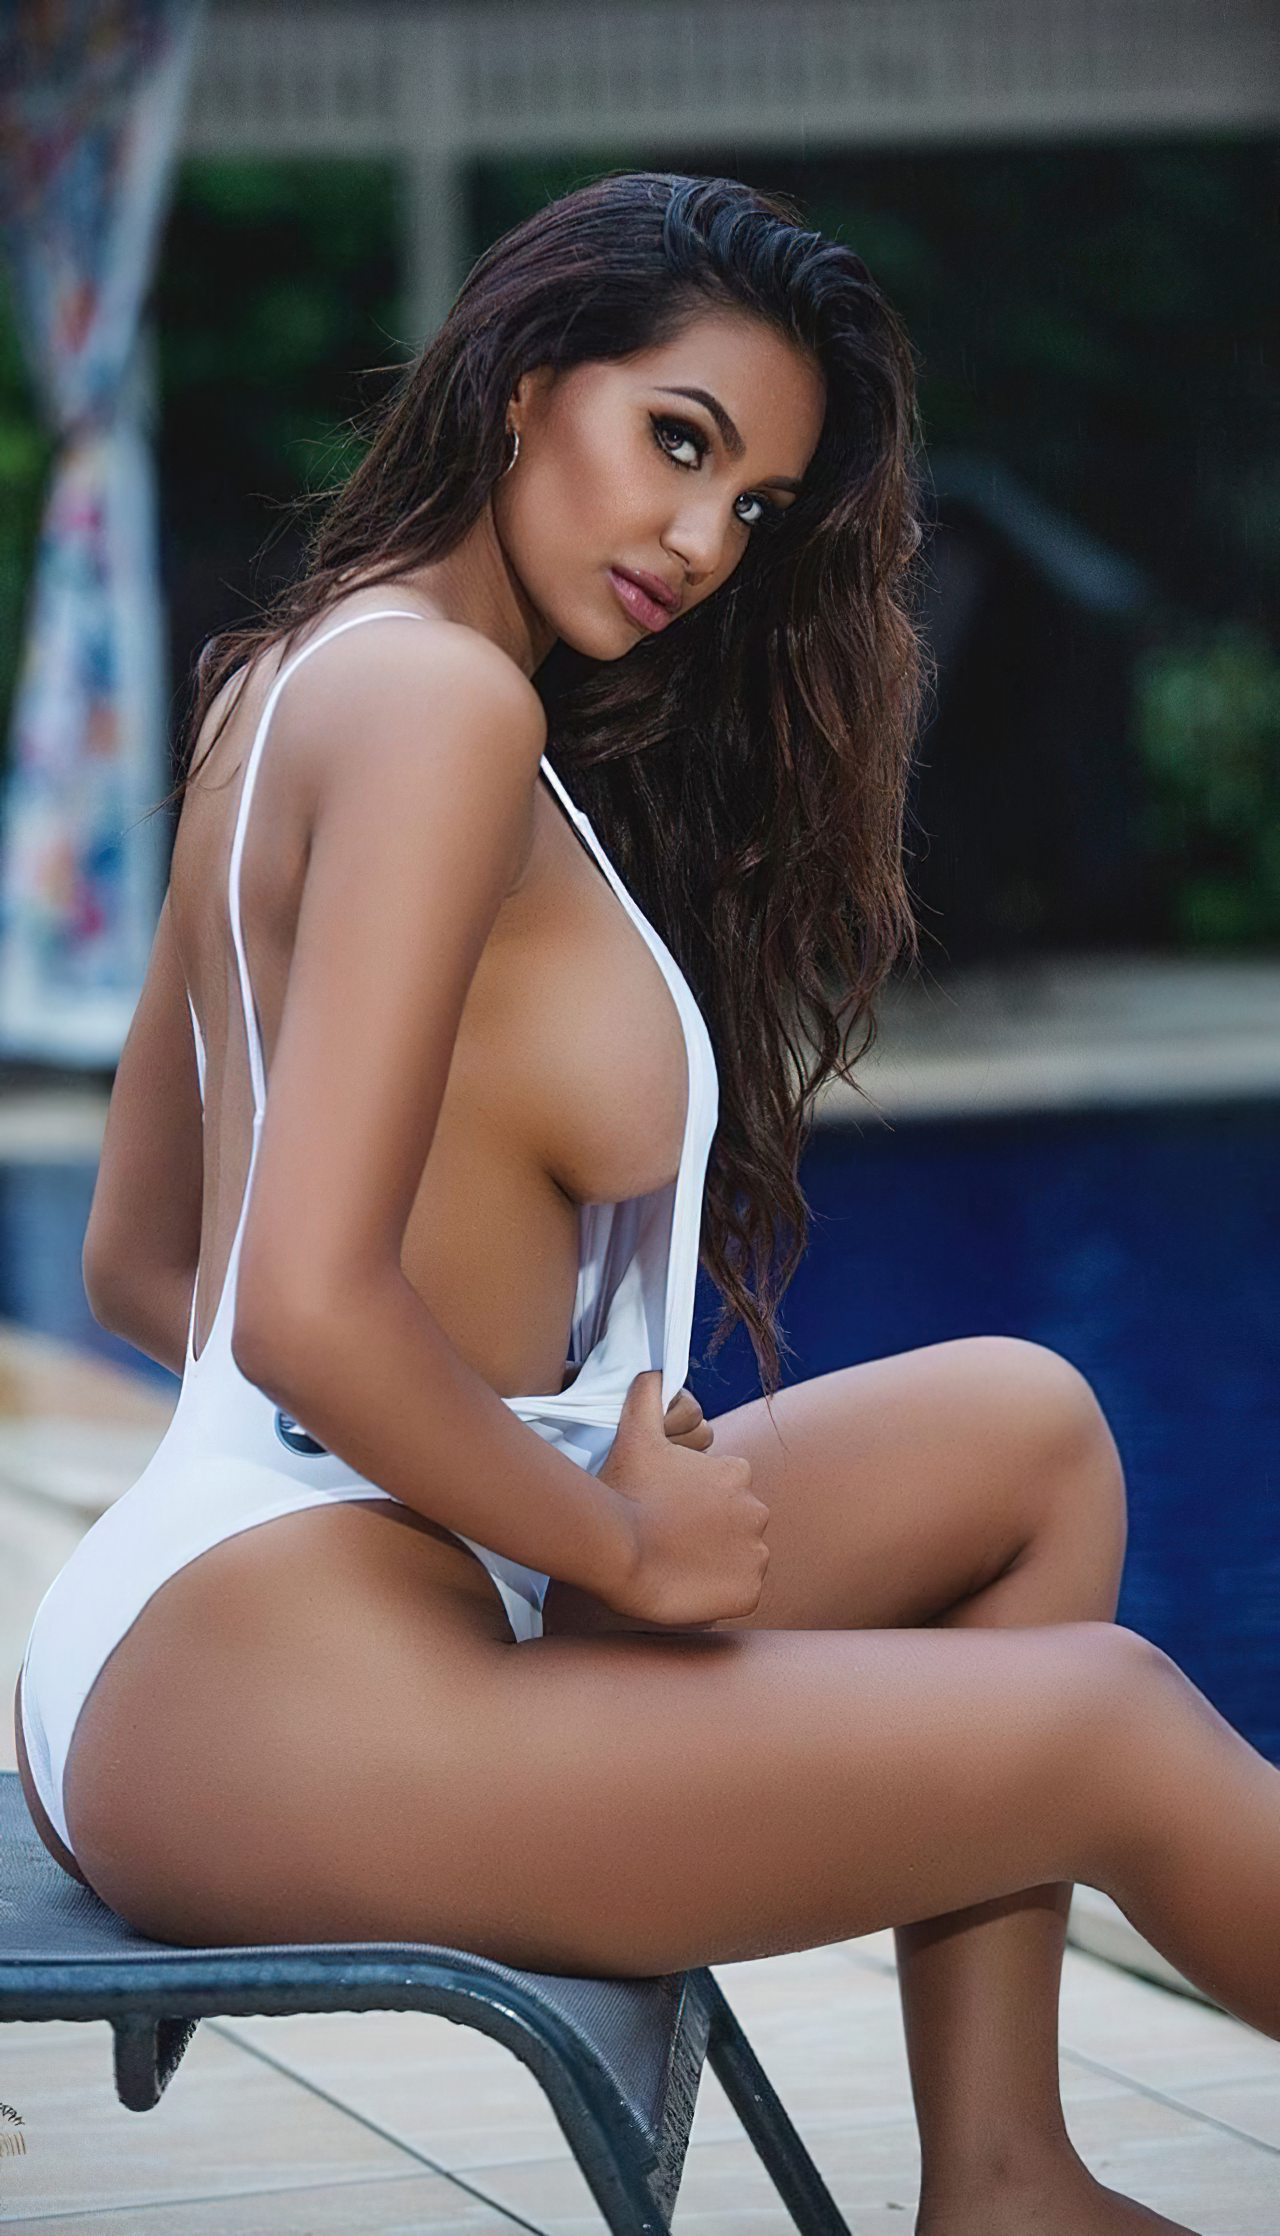 Fotos Mulheres Despidas (47)